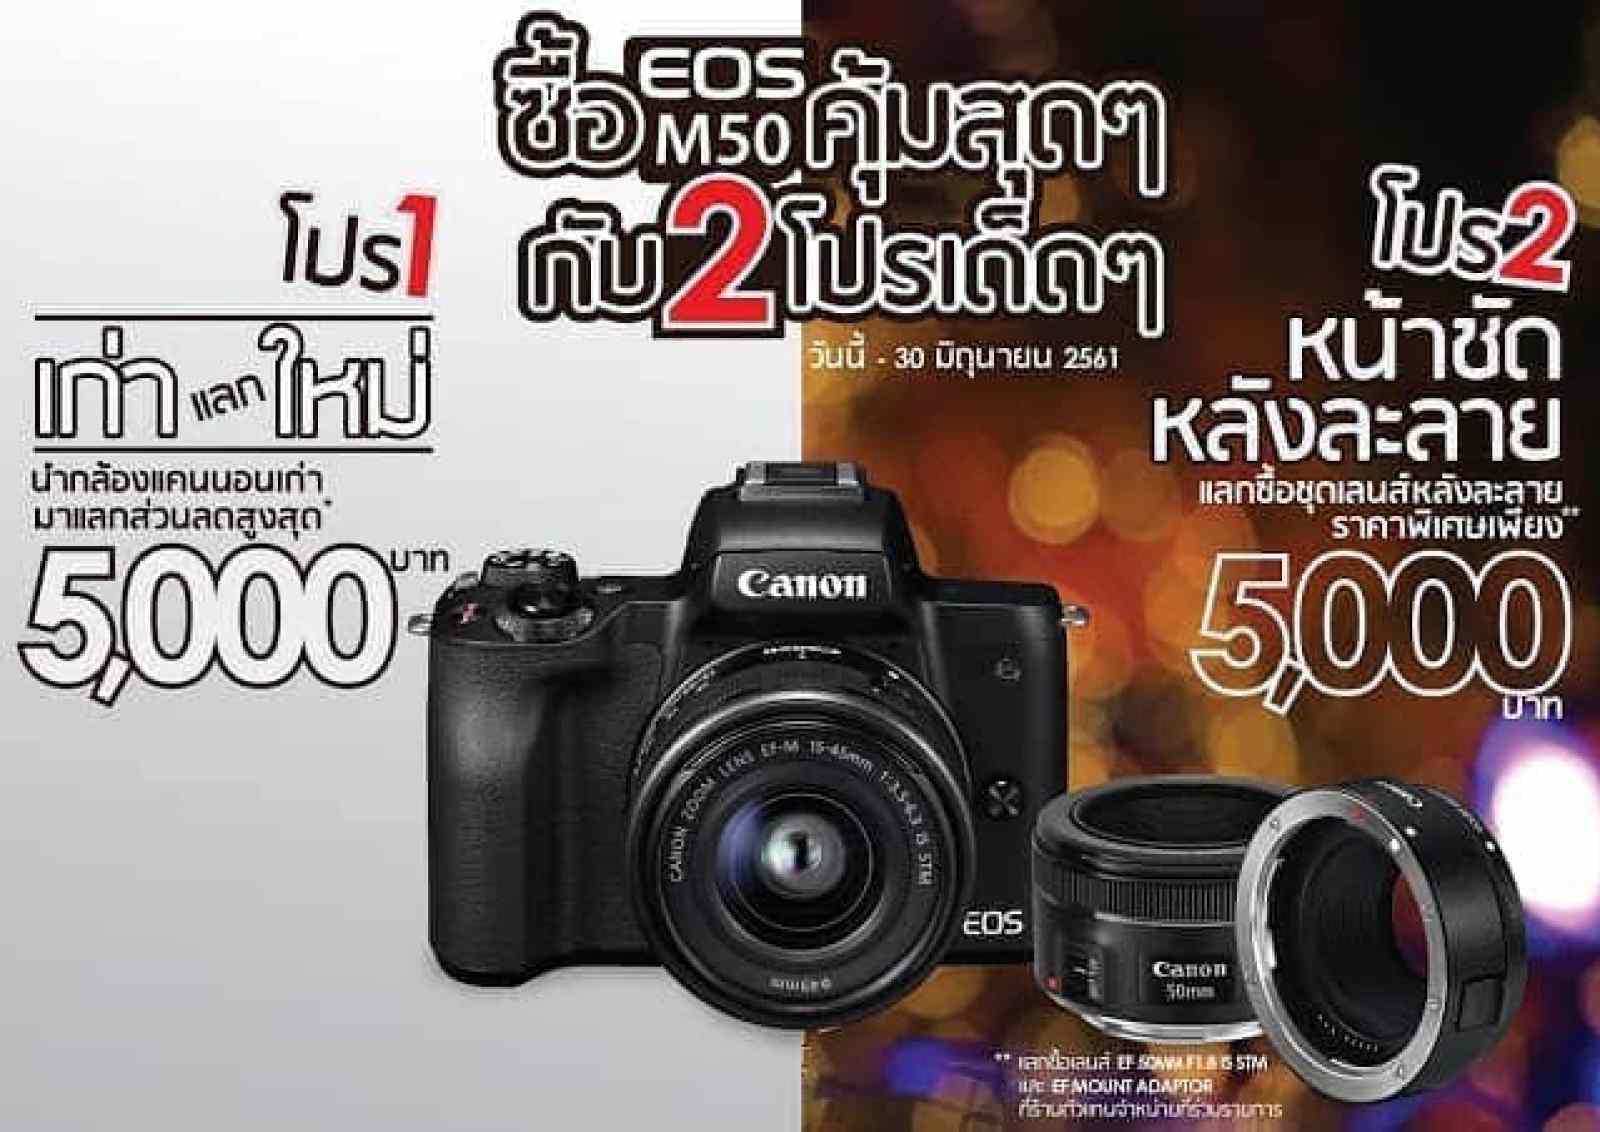 - promotion eosm50 comboset 2 - Canon จัดโปรโมชั่นสุดคุ้ม ดับเบิ้ล X2 กล้องเก่าแลกซื้อกล้องใหม่ EOS M50 พร้อมแลกซื้อชุดเลนส์ในราคาสุดพิเศษ